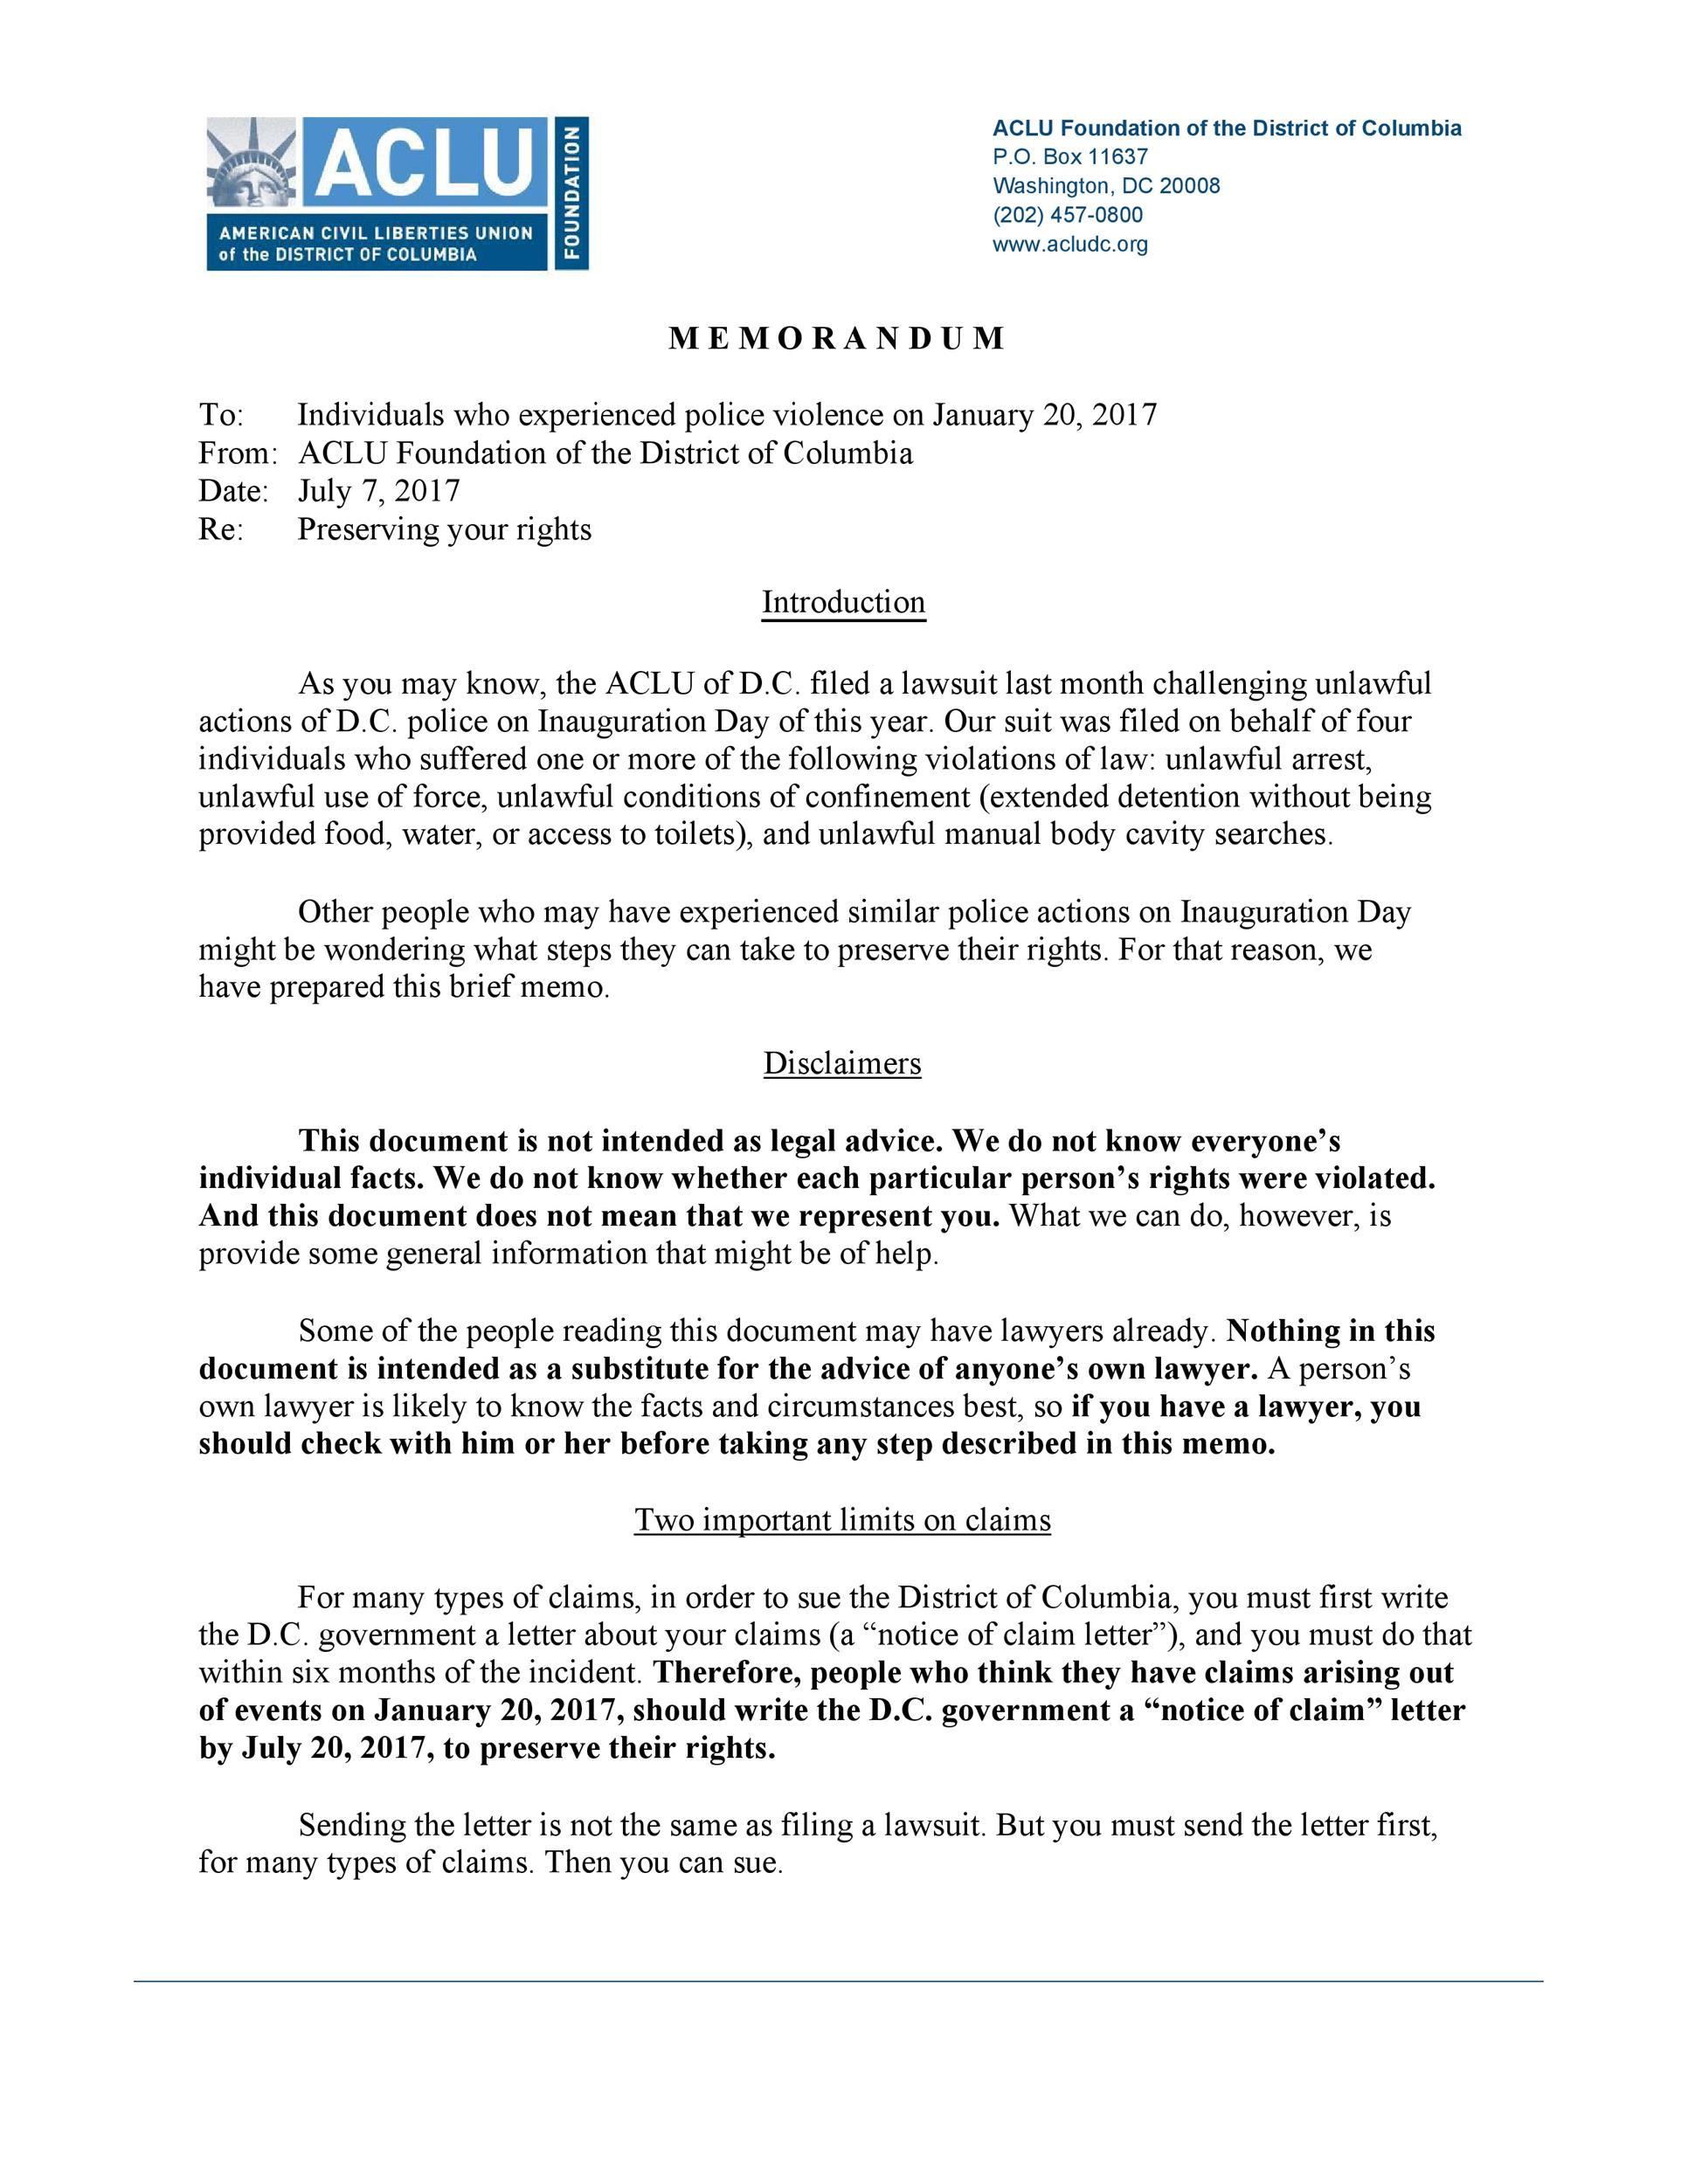 Free claim letter  10